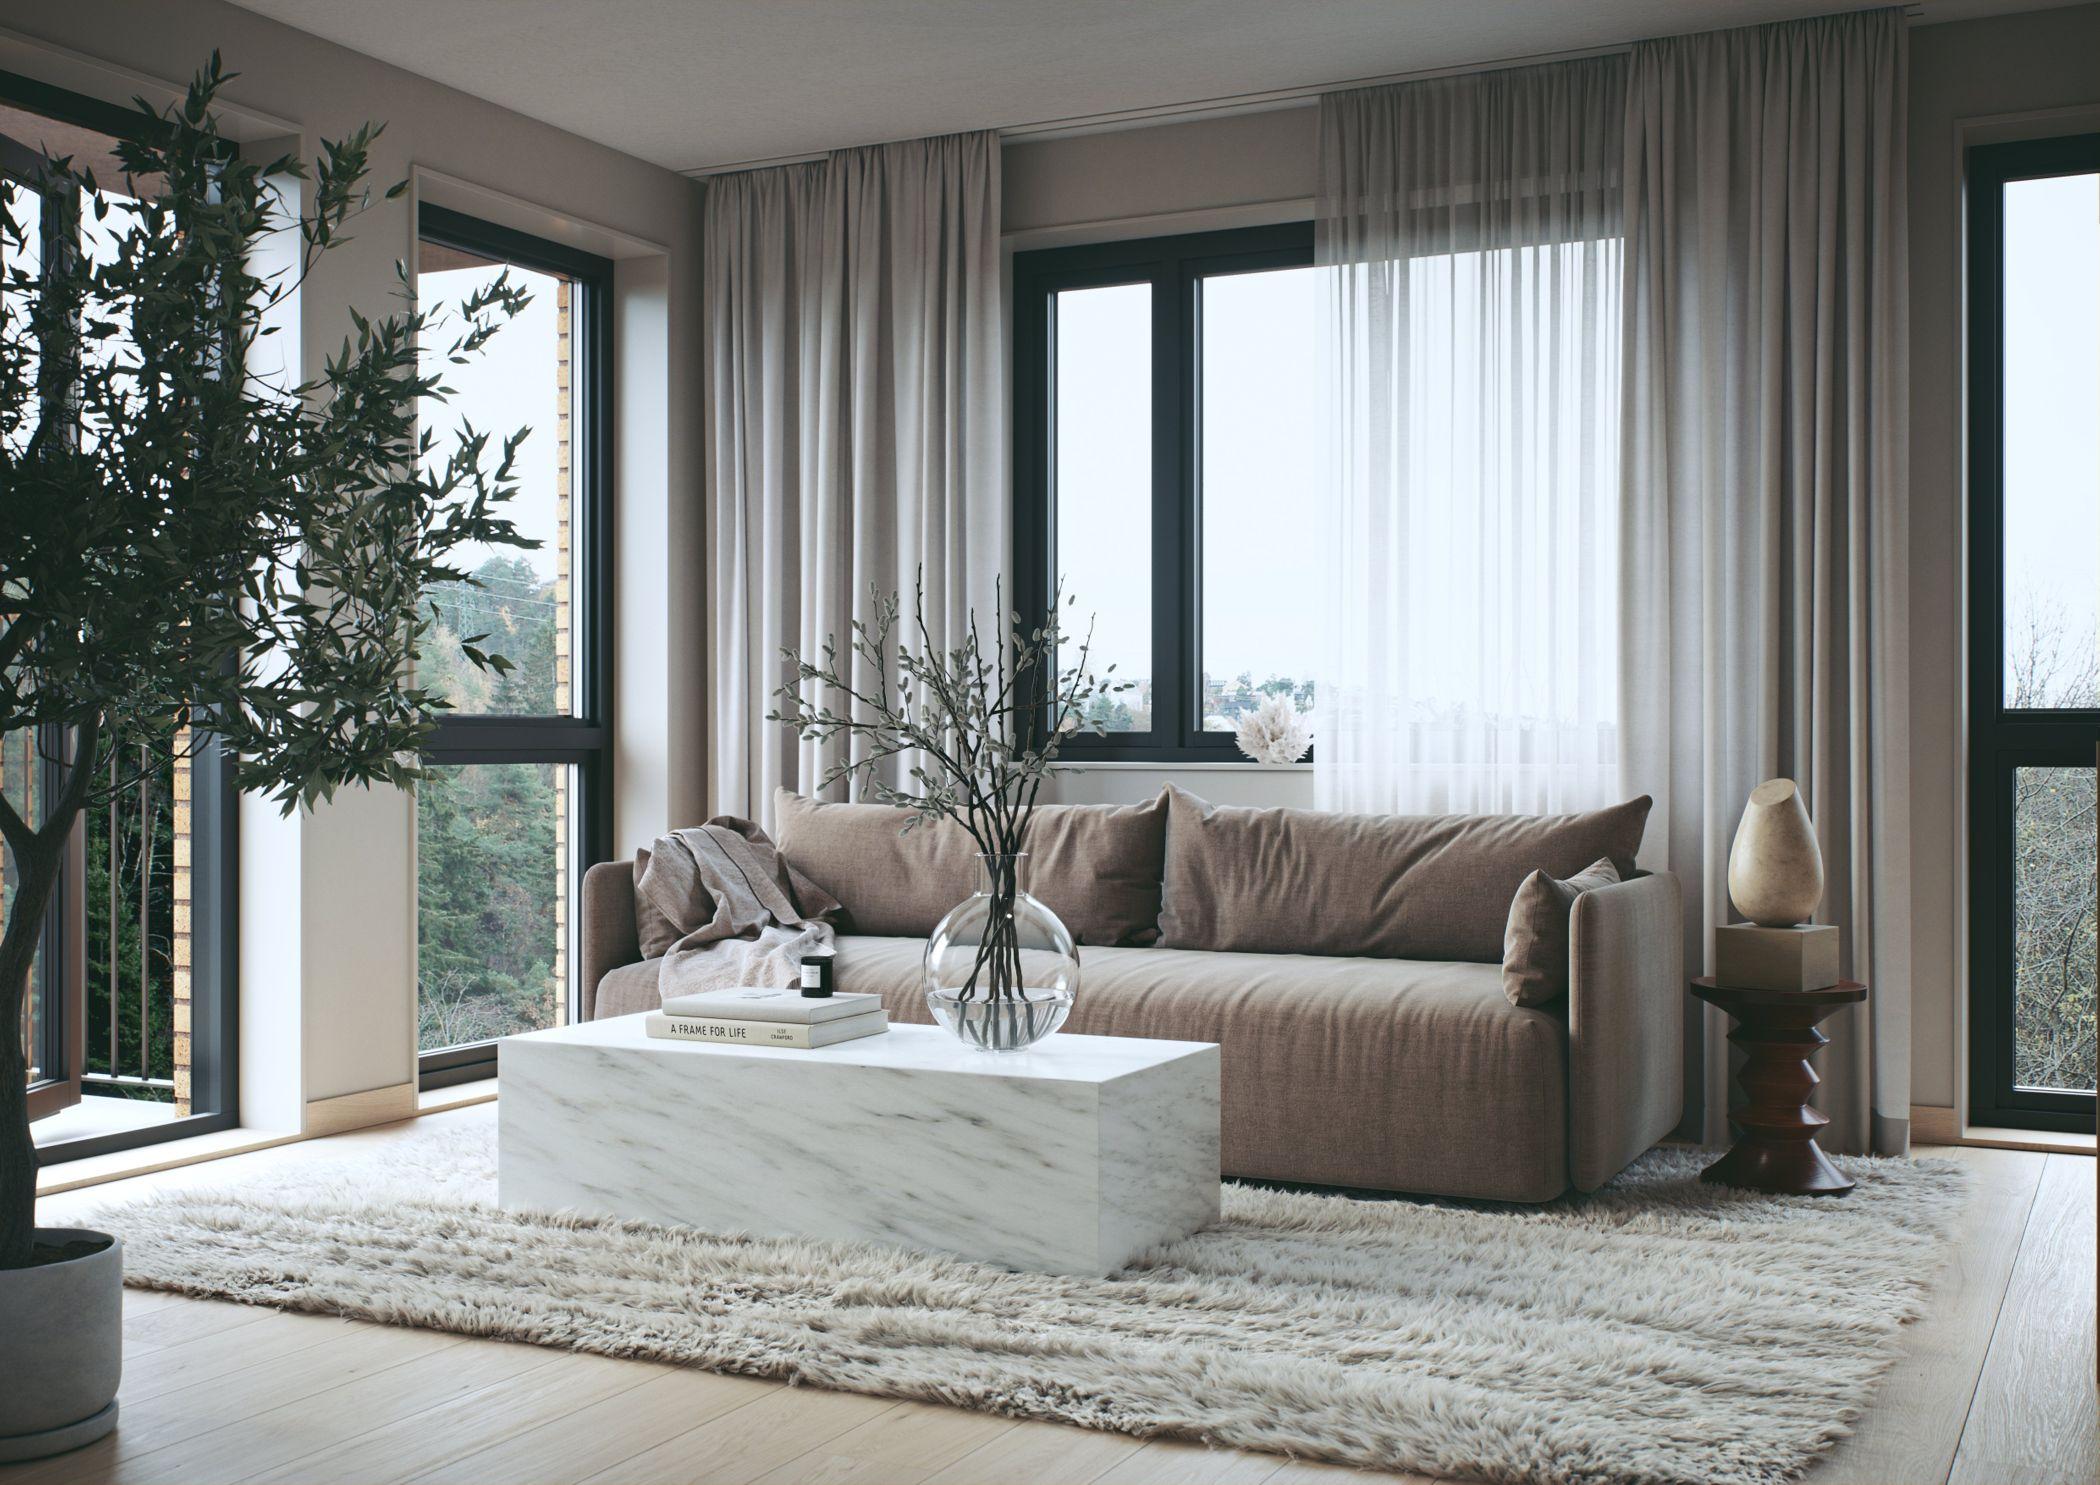 Arnljot_Gellines_vei_LA1105_Livingroom1 2.jpg